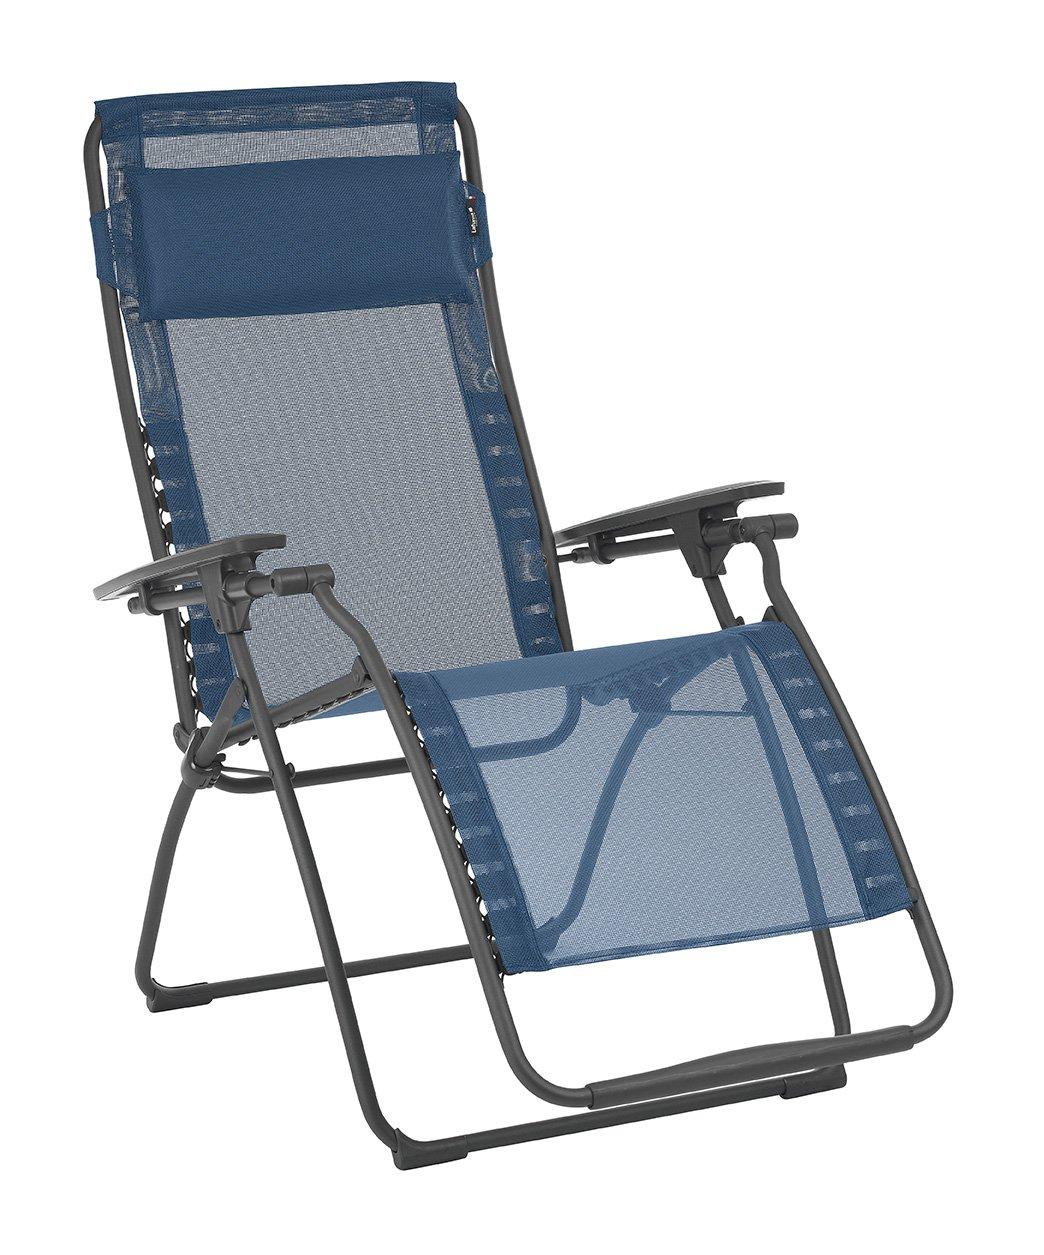 Lafuma LFM3118-8547 Futura Zero Gravity Recliner-Basalt Steel Frame, Ocean Batyline Fabric